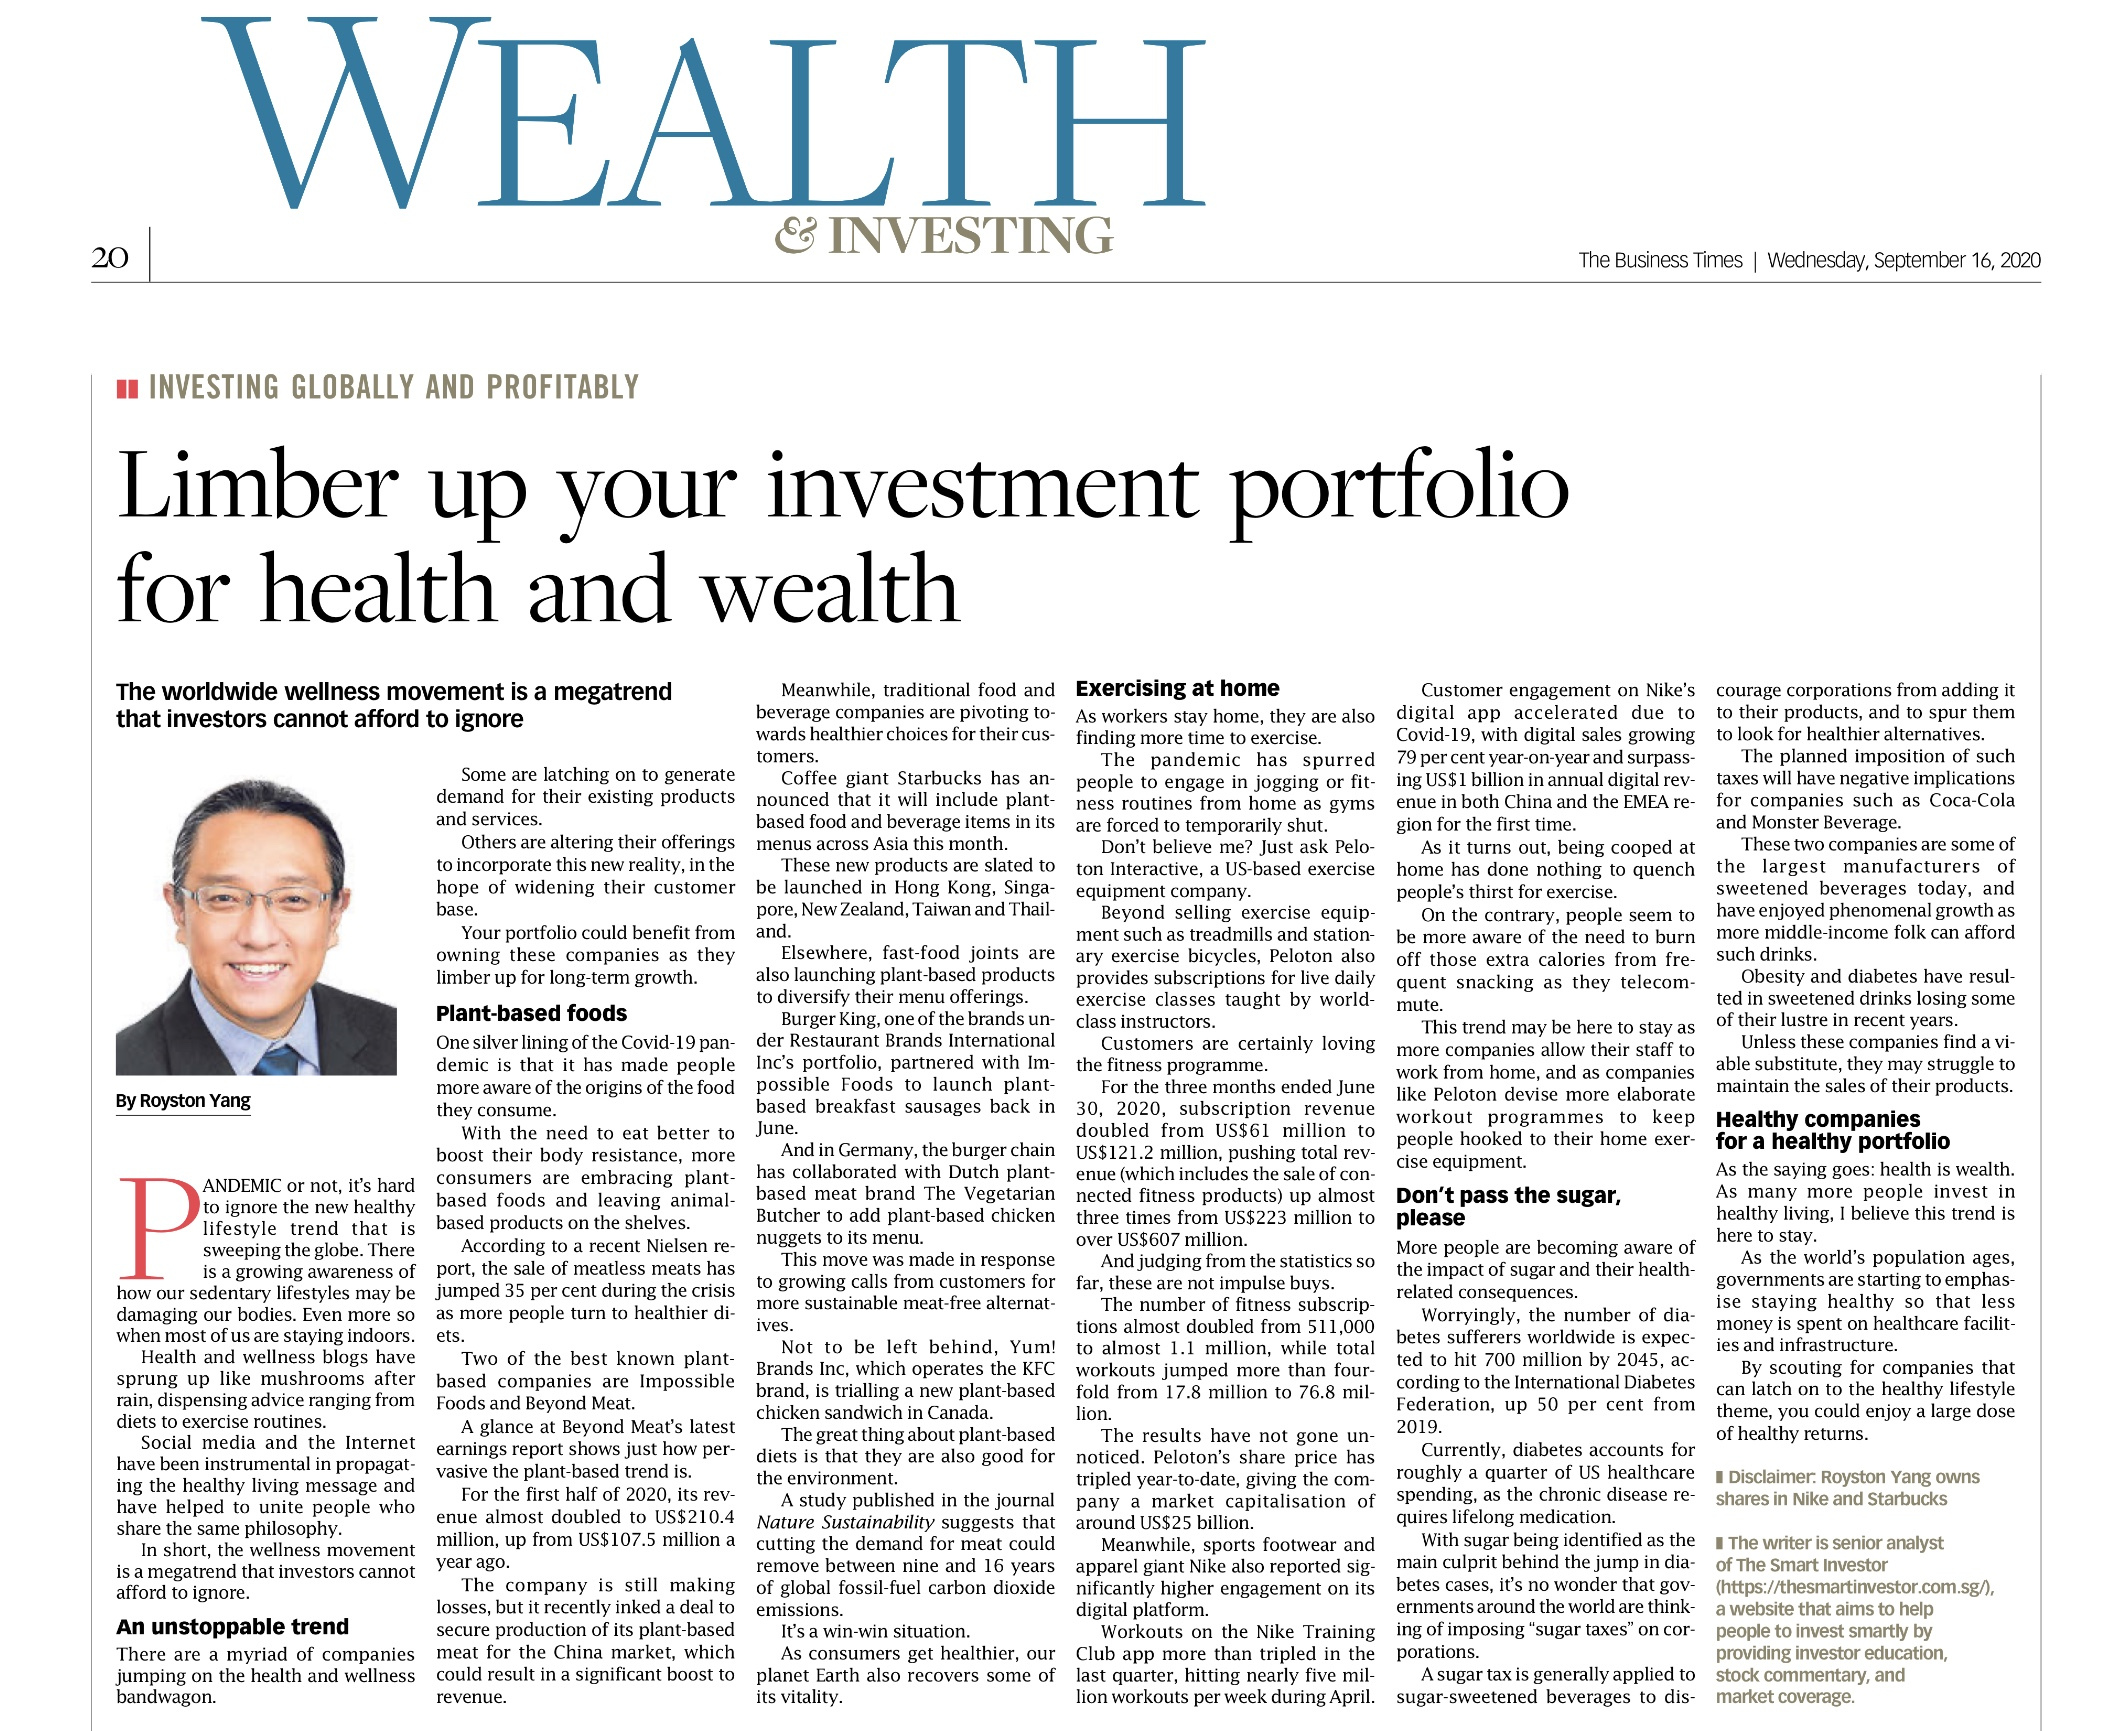 Health&Wealth